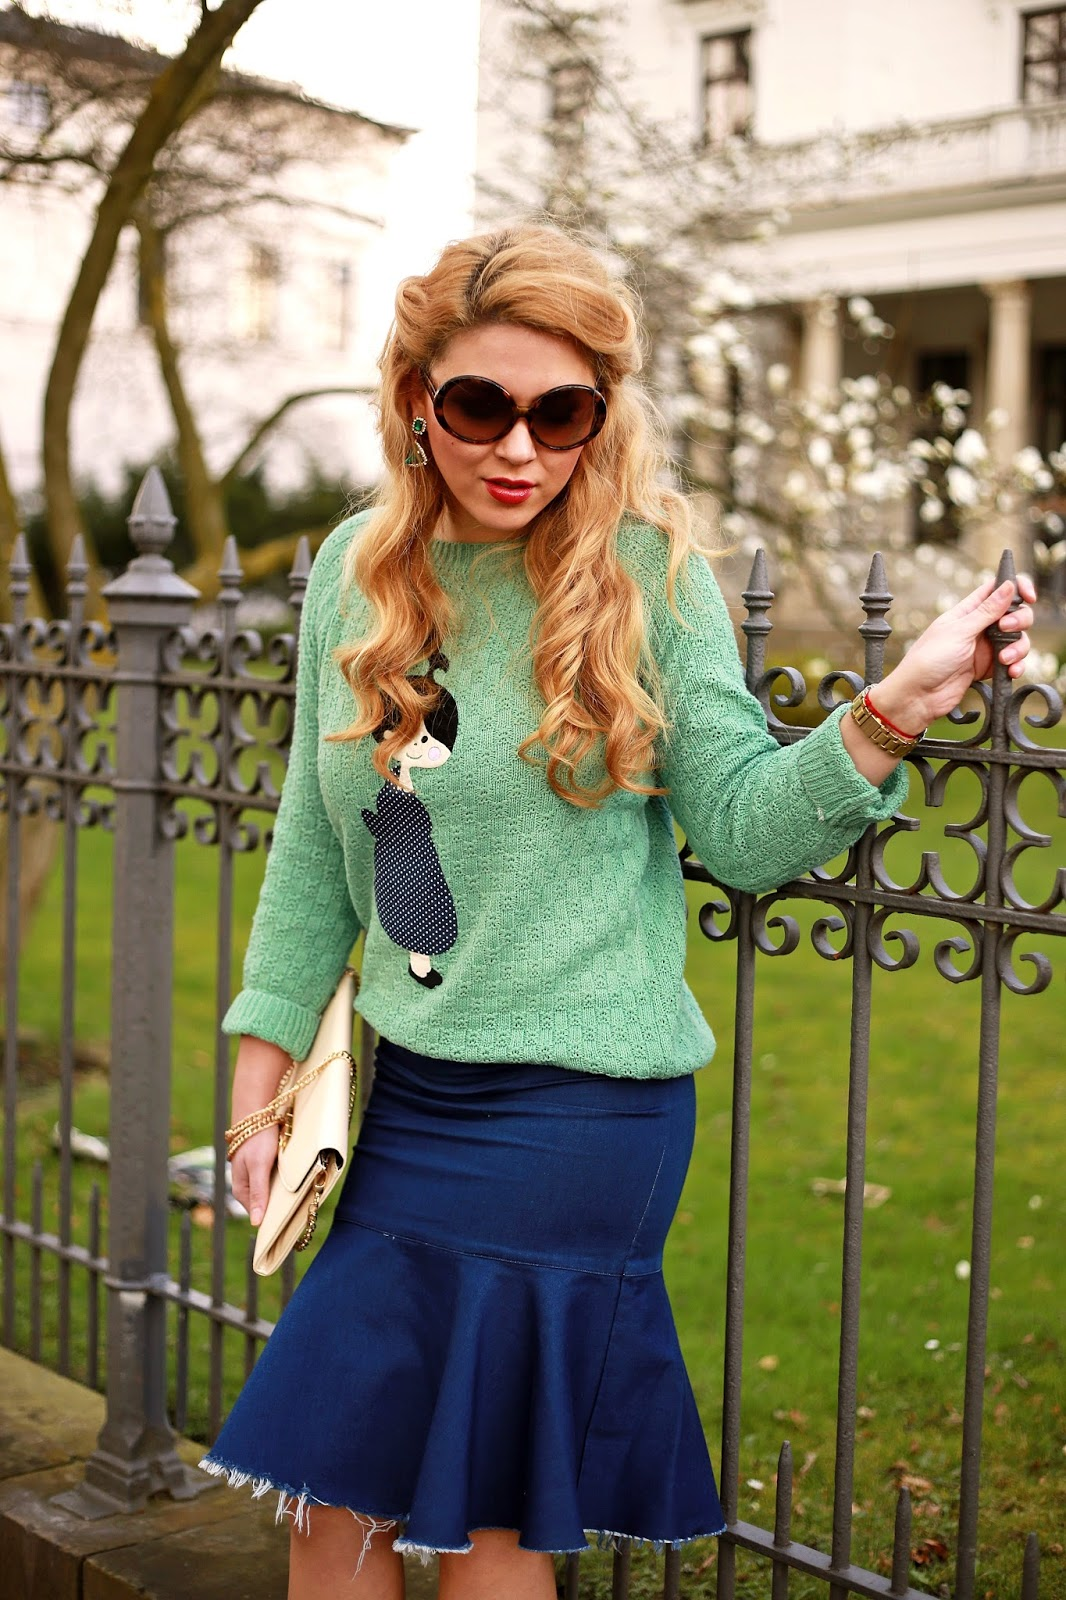 "Foto: Reprodução / <a href=""http://www.fashionpainteddreams.com/2014/03/peplum-skirt.html"" target=""_blank"">Fashion painted dreams</a>"